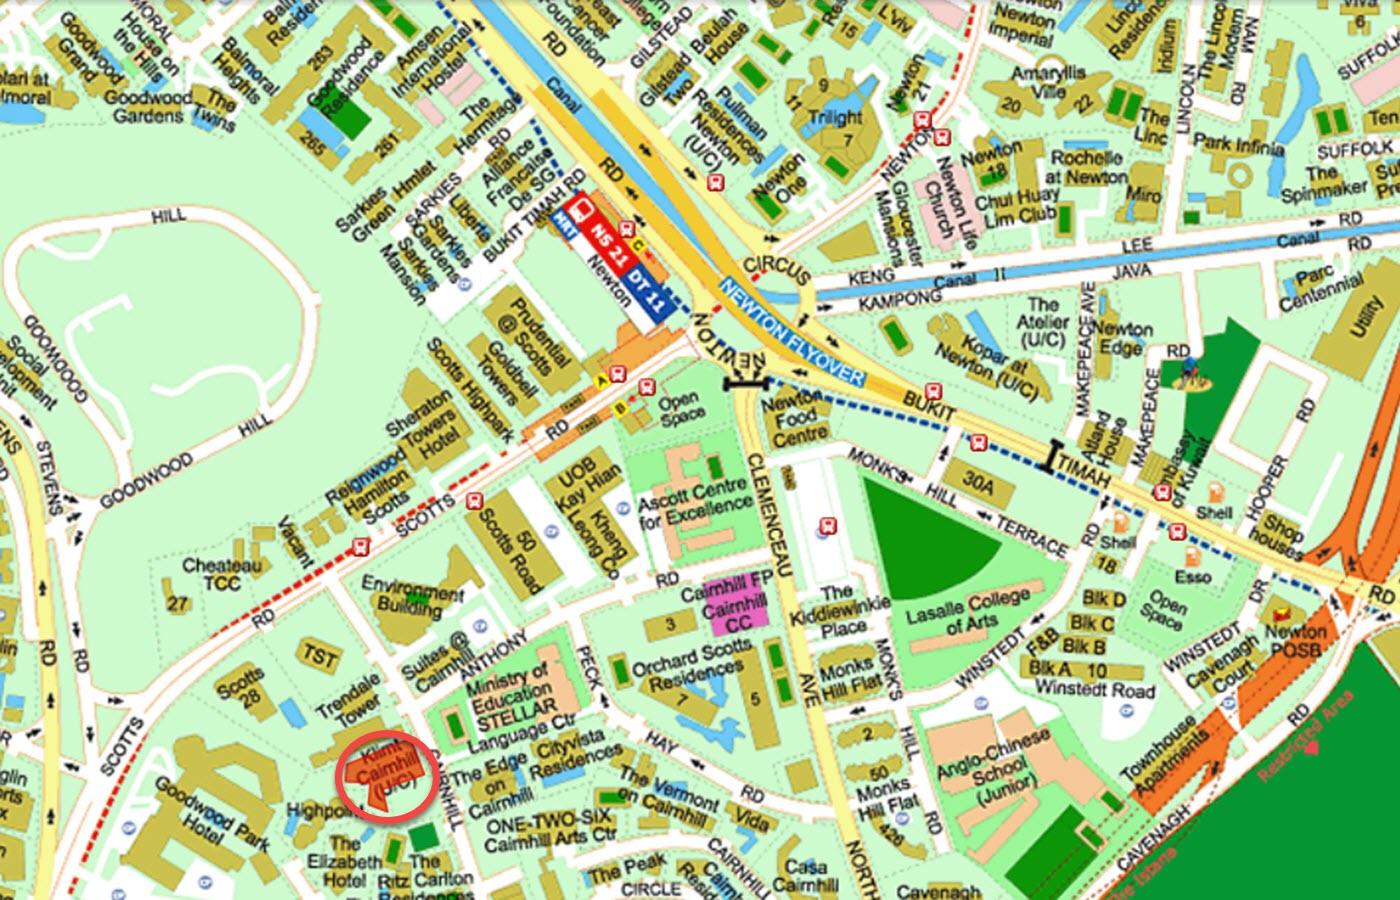 Klimt Cairnhill Condo Location - Street Directory Map